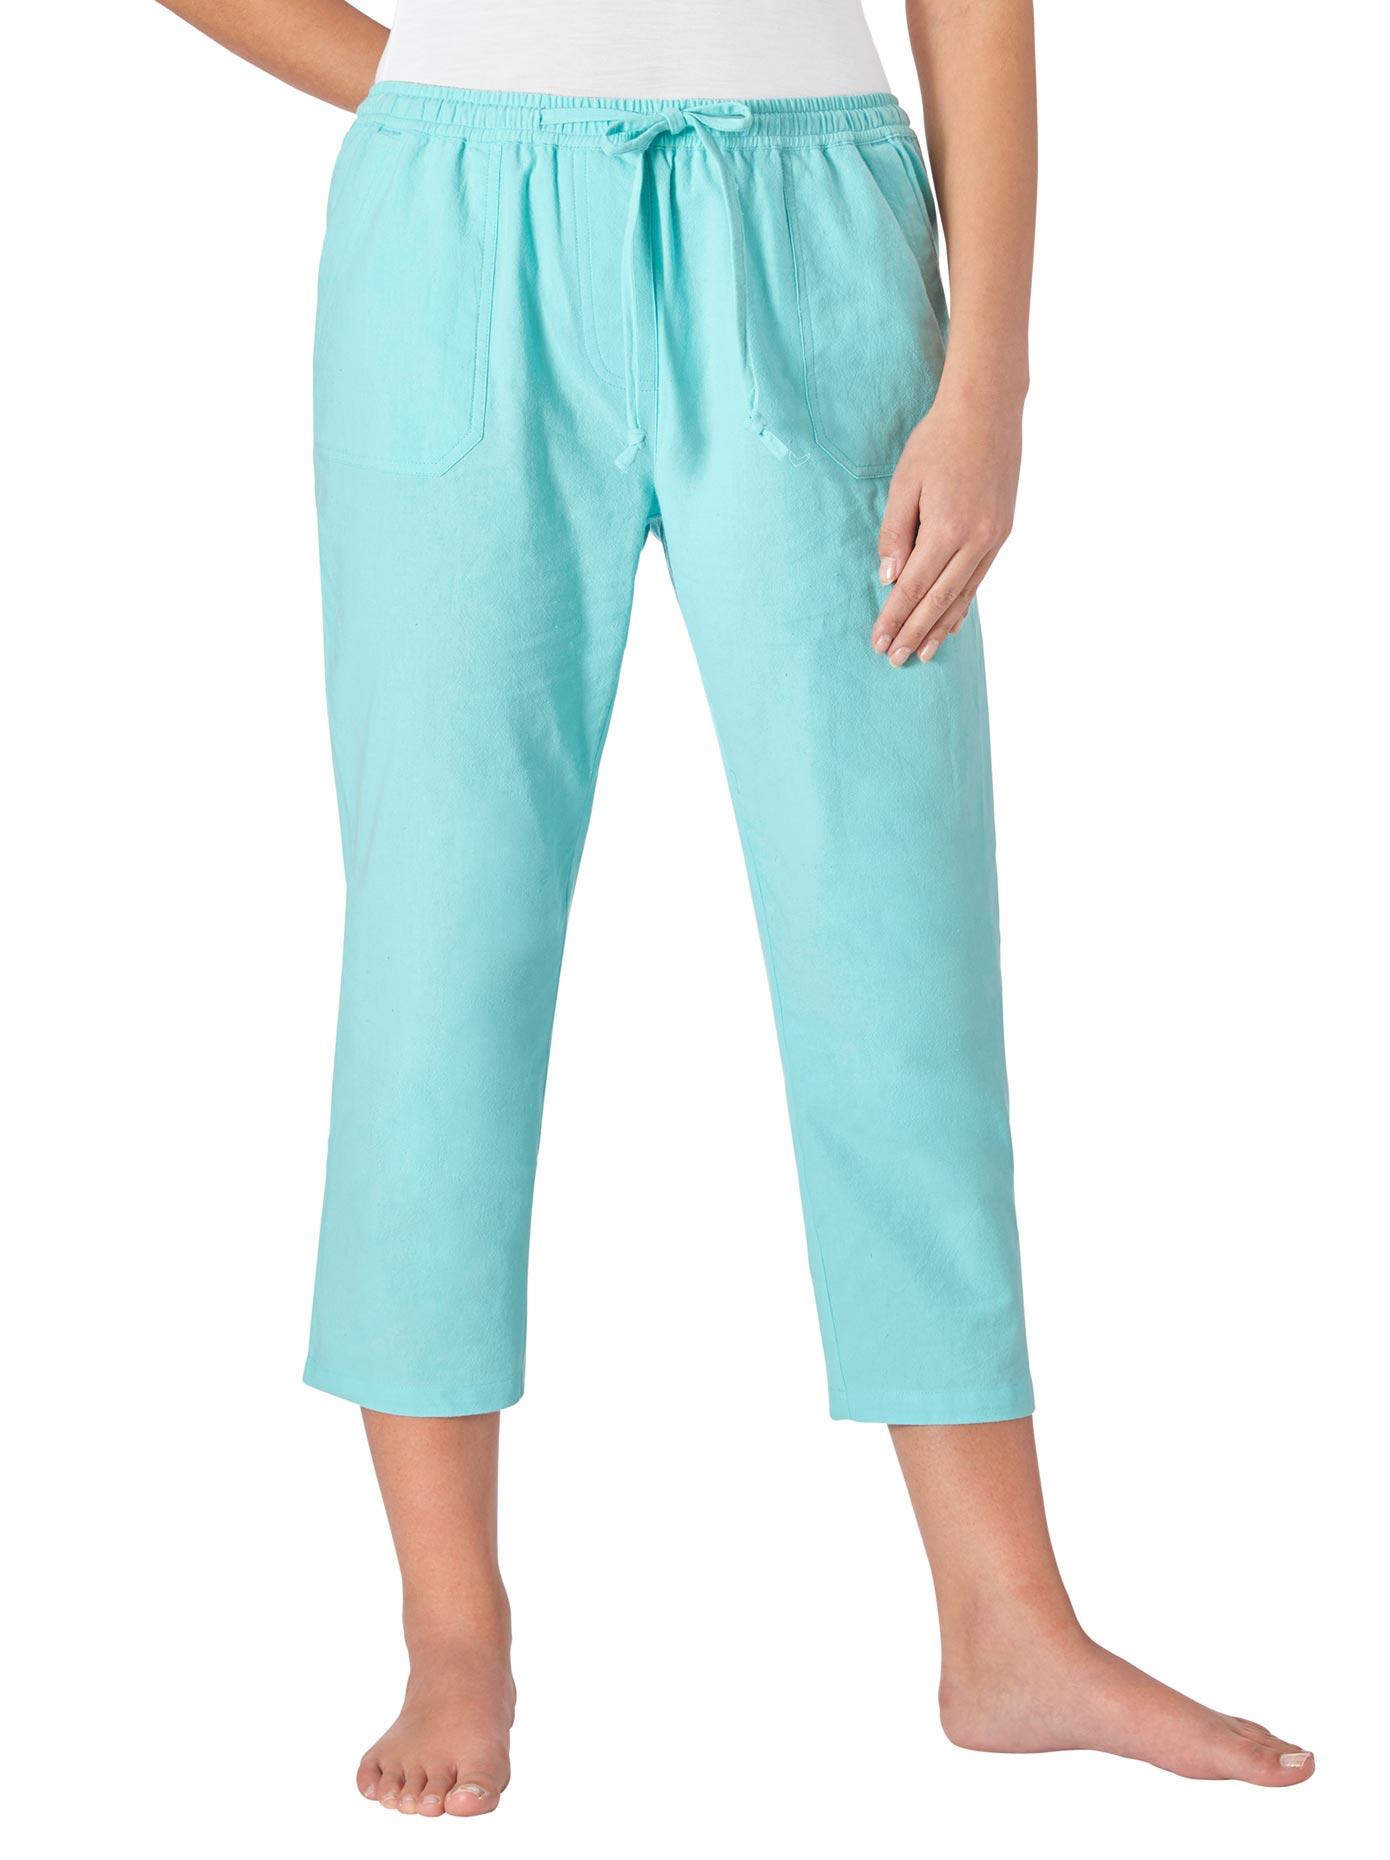 Classic Basics Hose wadenlang in trageangenehmer und bügelfreier Qualität | Bekleidung > Hosen > Sonstige Hosen | Classic Basics